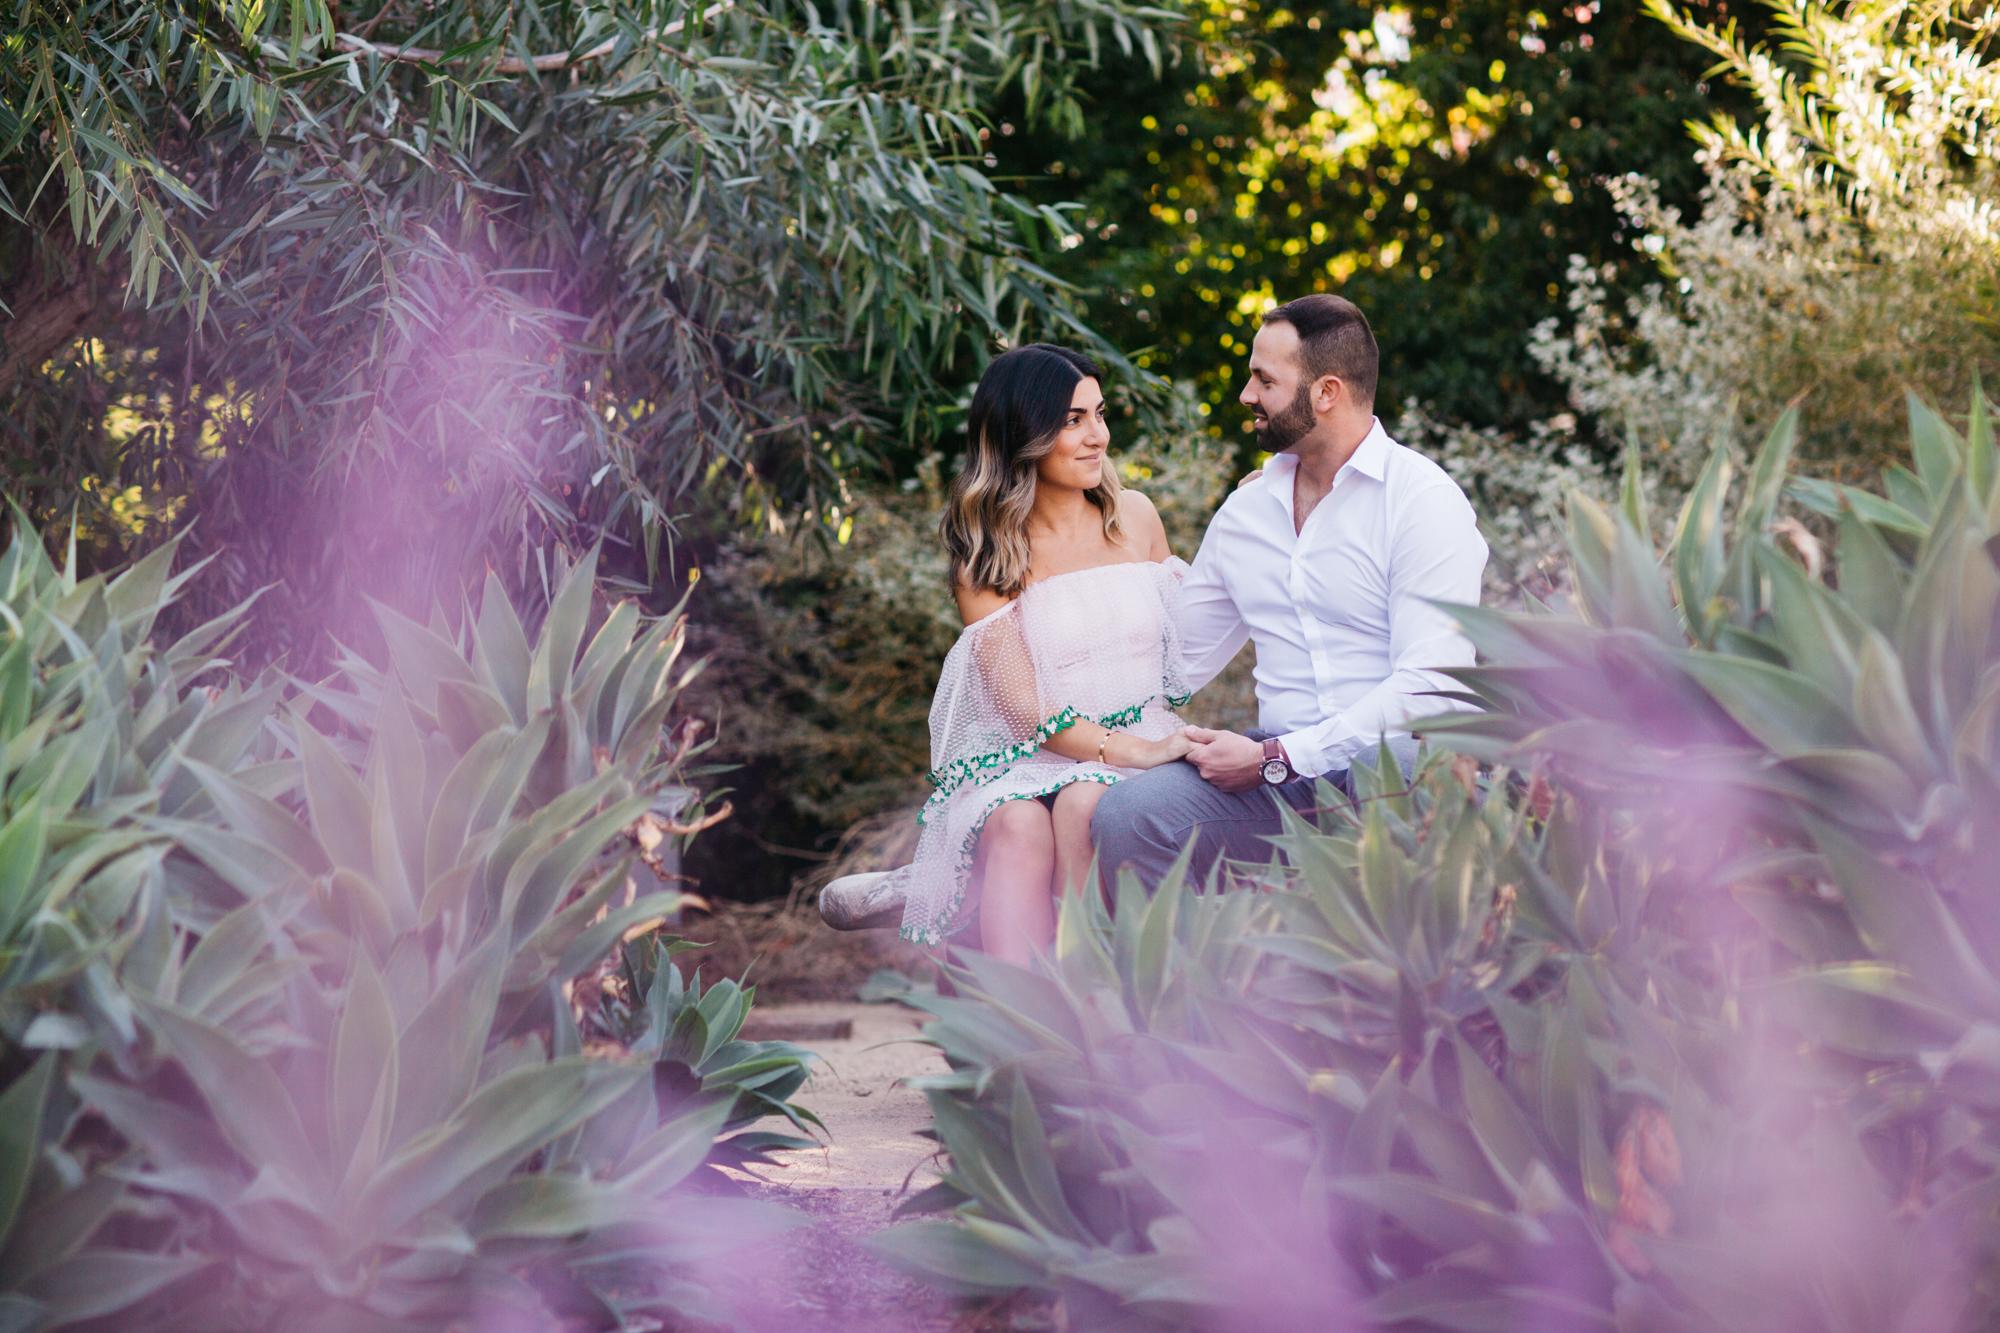 006-2018-LA-arboretum.jpg